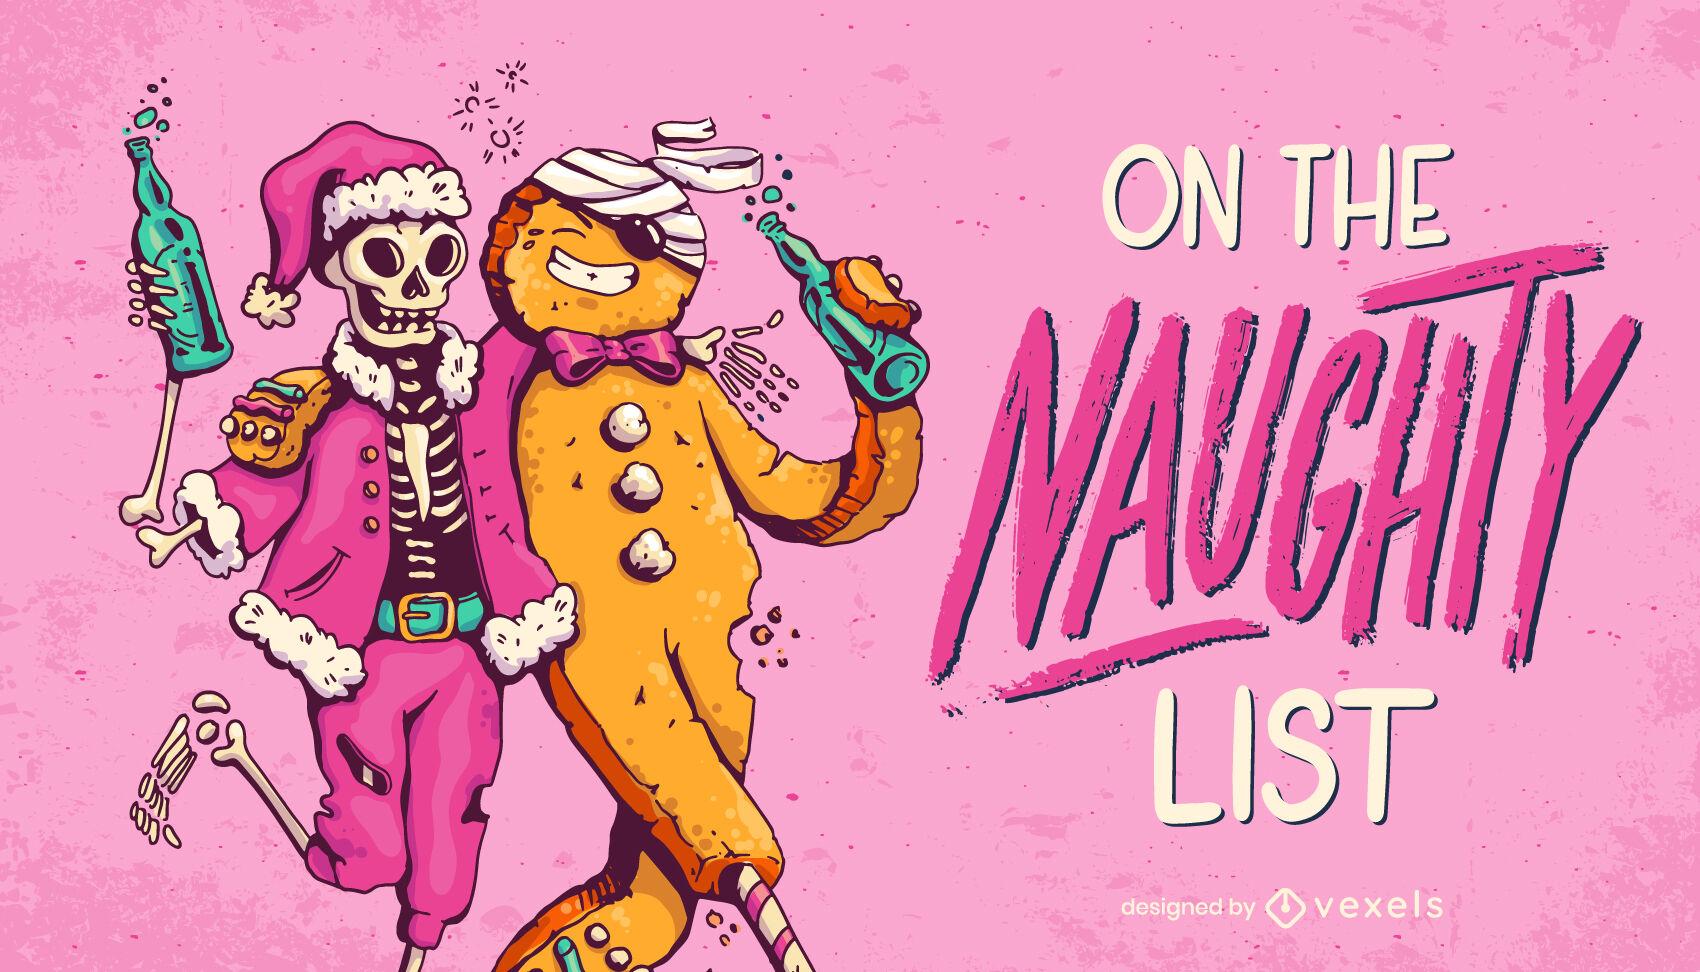 Cool naughty list Christmas illustration design